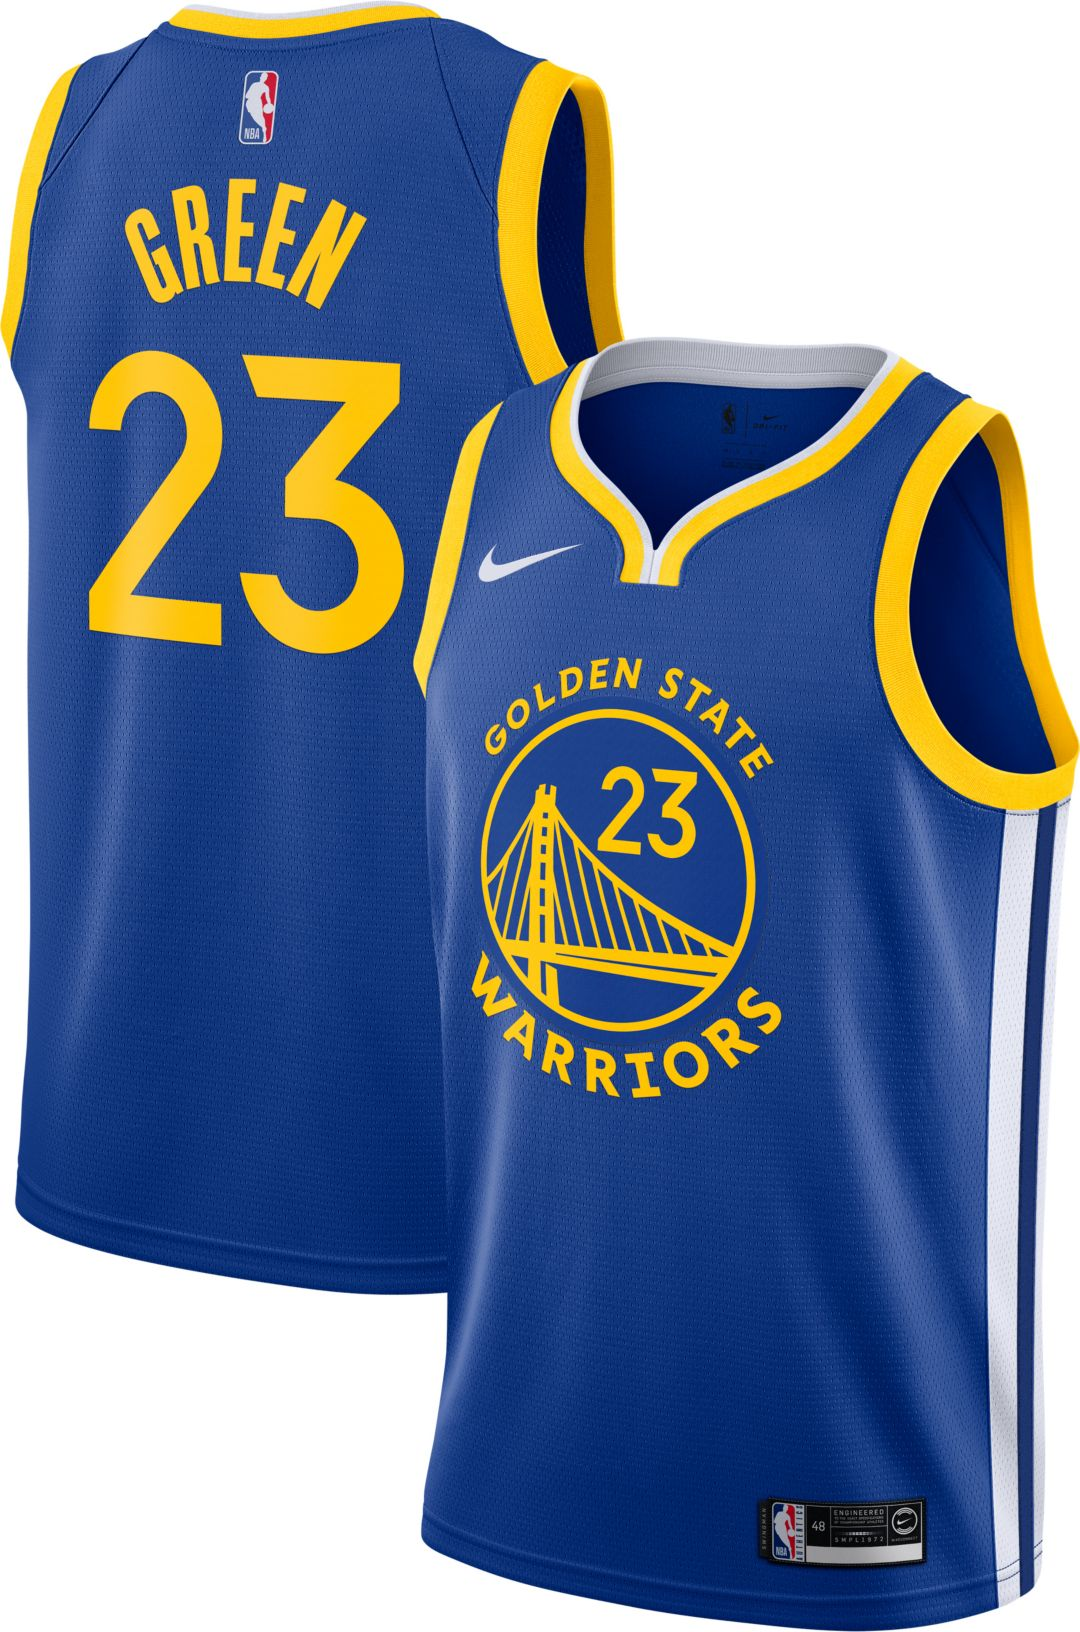 size 40 7f743 7419d Nike Men's Golden State Warriors Draymond Green #23 Royal Dri-FIT Swingman  Jersey